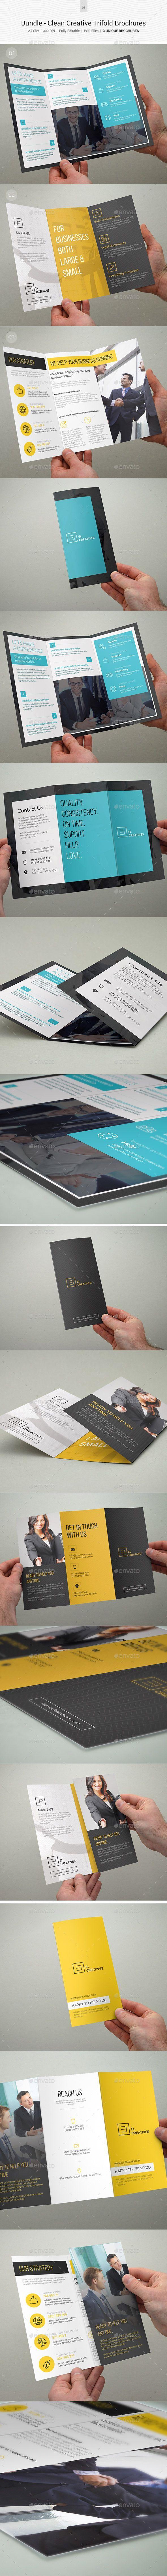 Bundle - Creative Trifold Business Brochures Template #brochure #trifold Download: http://graphicriver.net/item/bundle-creative-trifold-business-brochures-03/11403874?ref=ksioks